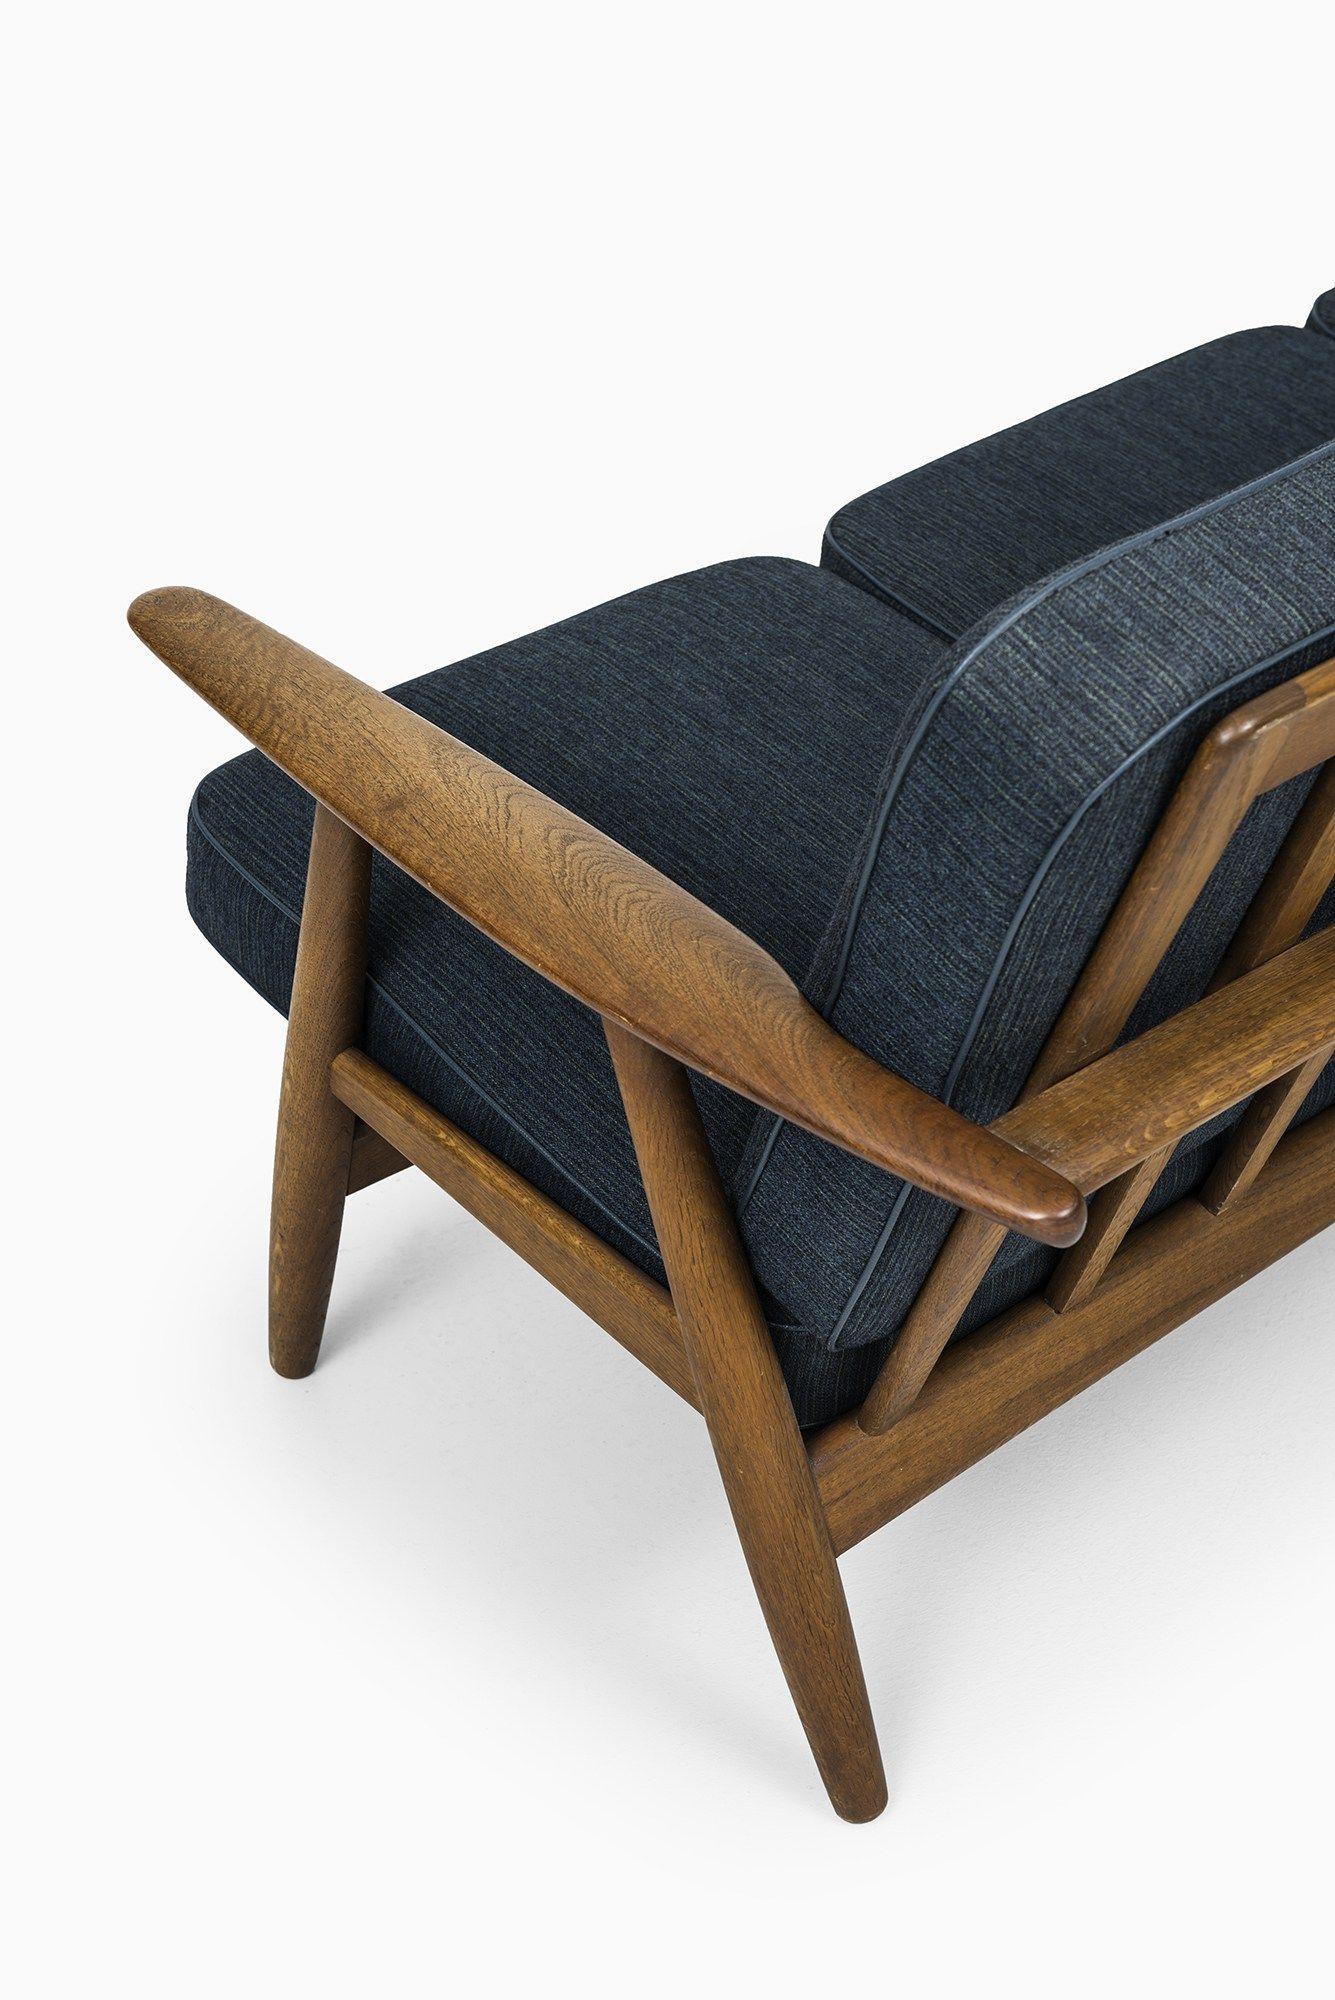 Hans Wegner sofa model GE 240 by Getama at Studio Schalling